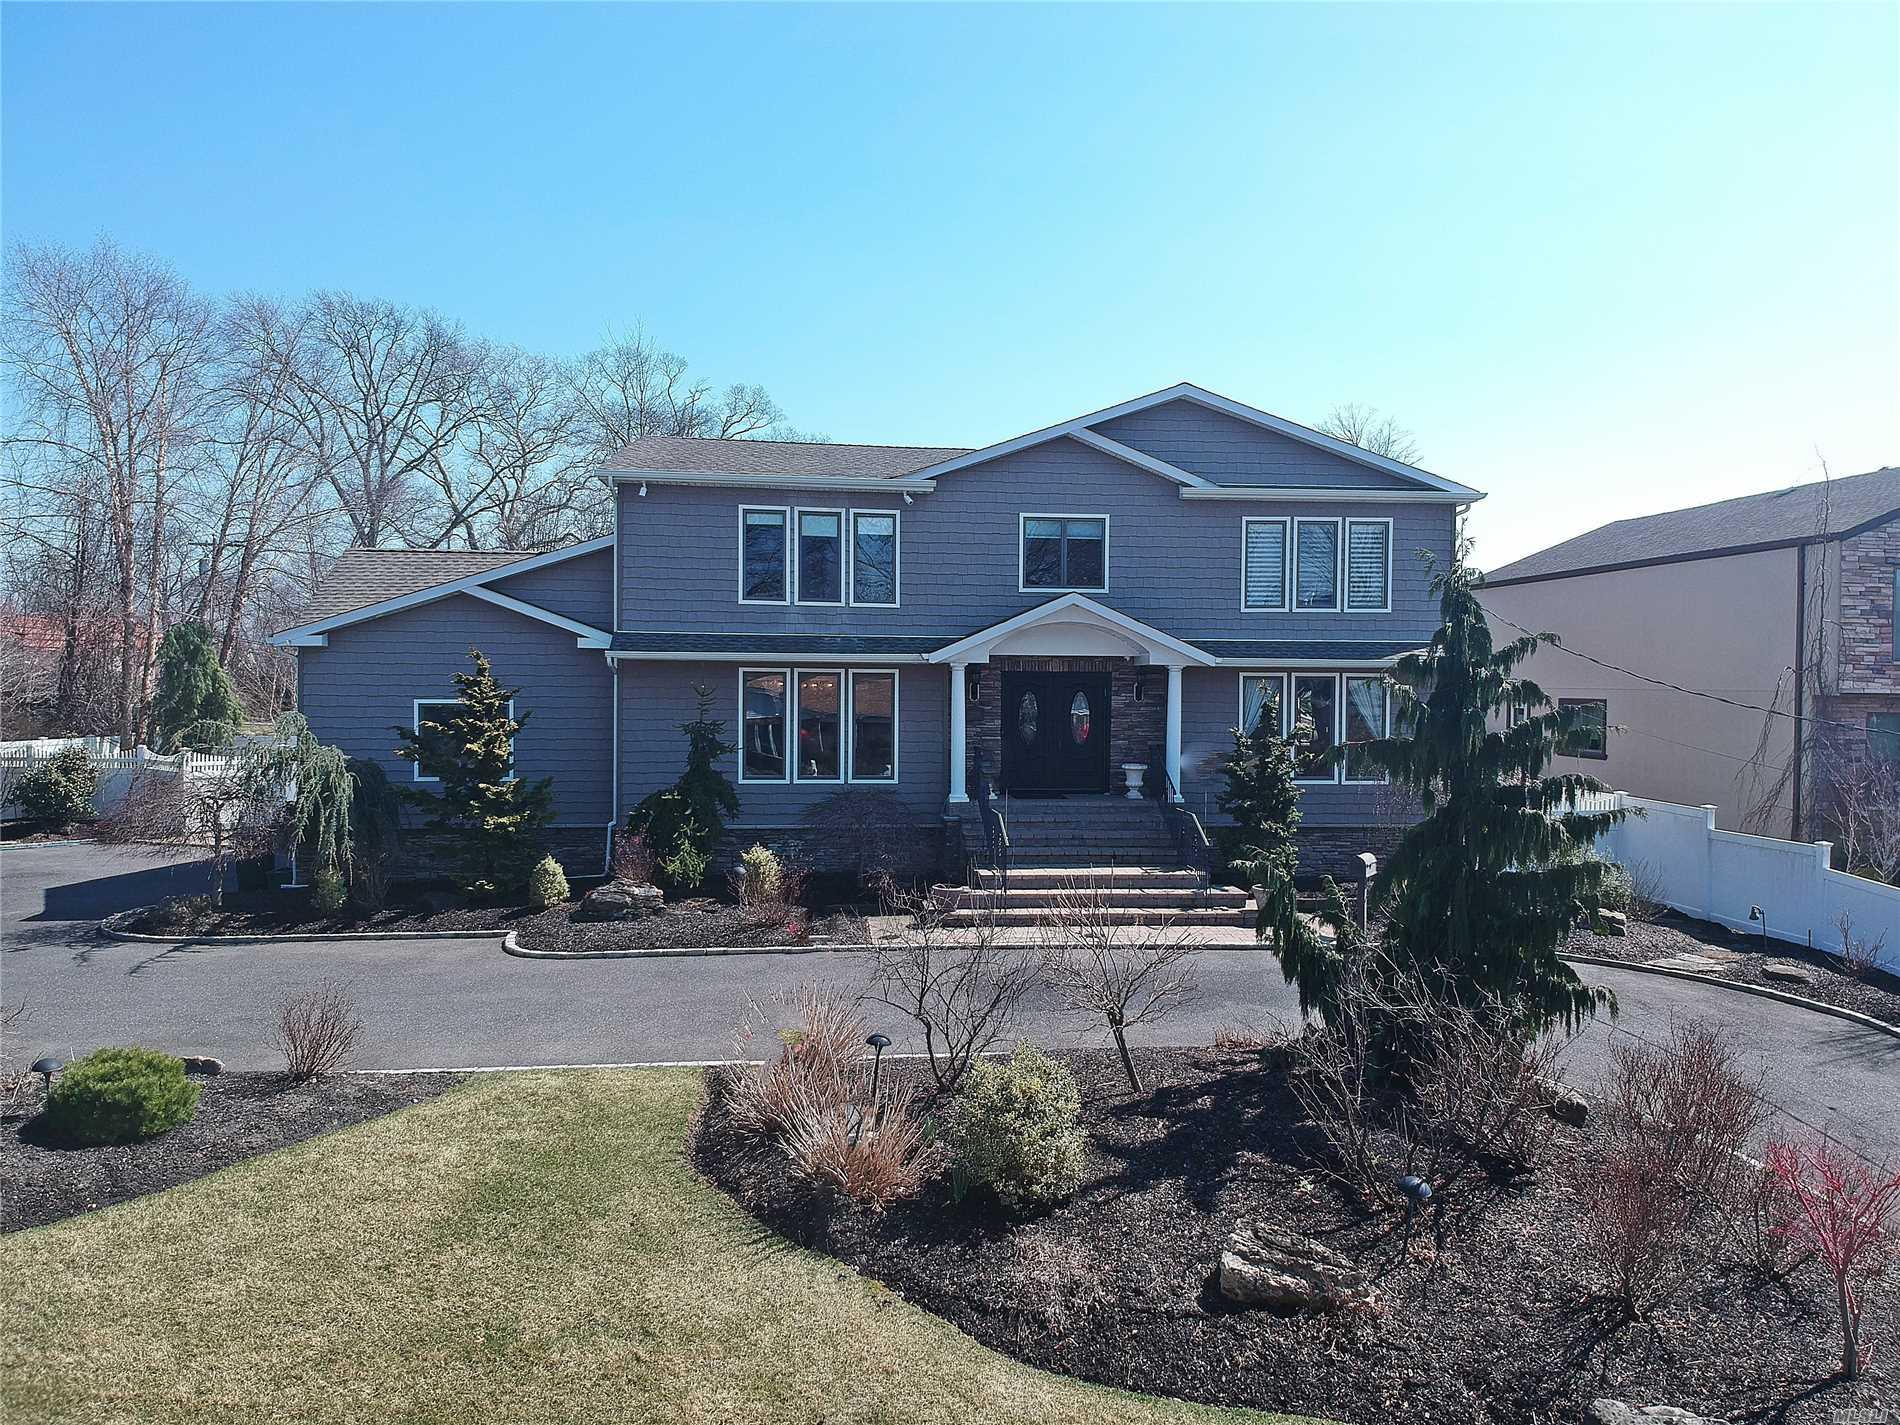 2018 Lake End Rd Merrick, NY 11566